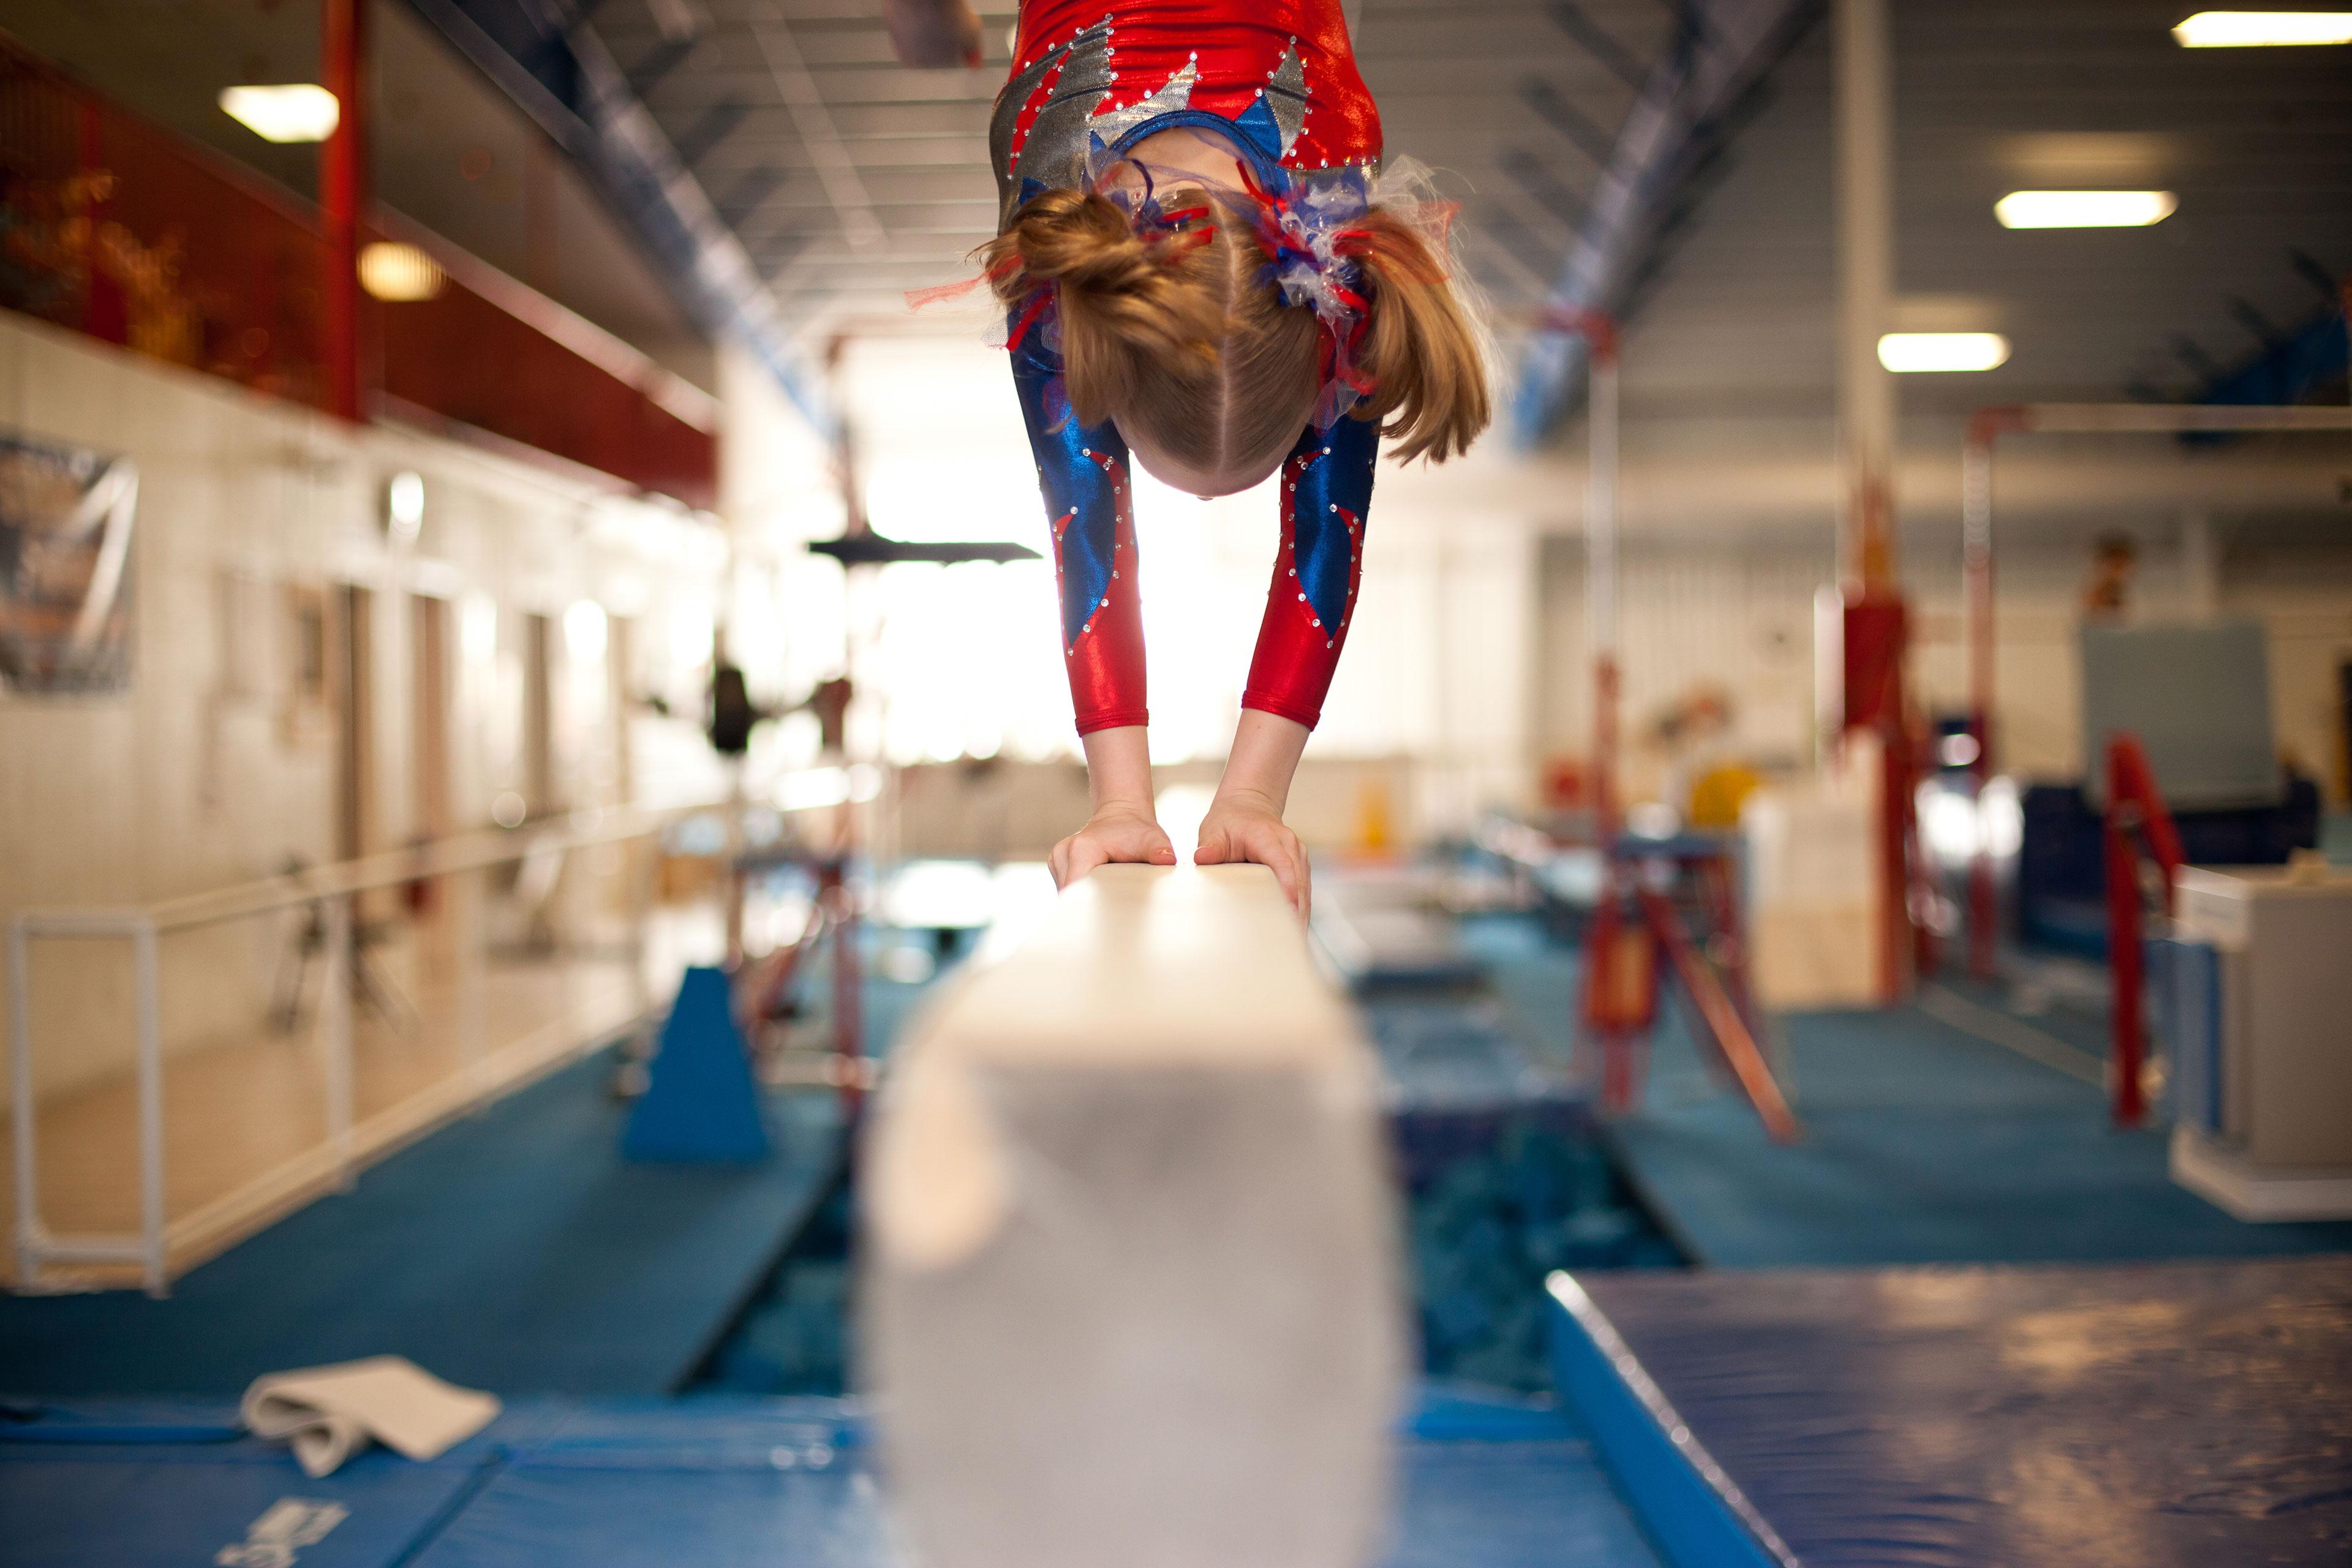 EY - Young girl gymnast doing handstand on balance beam